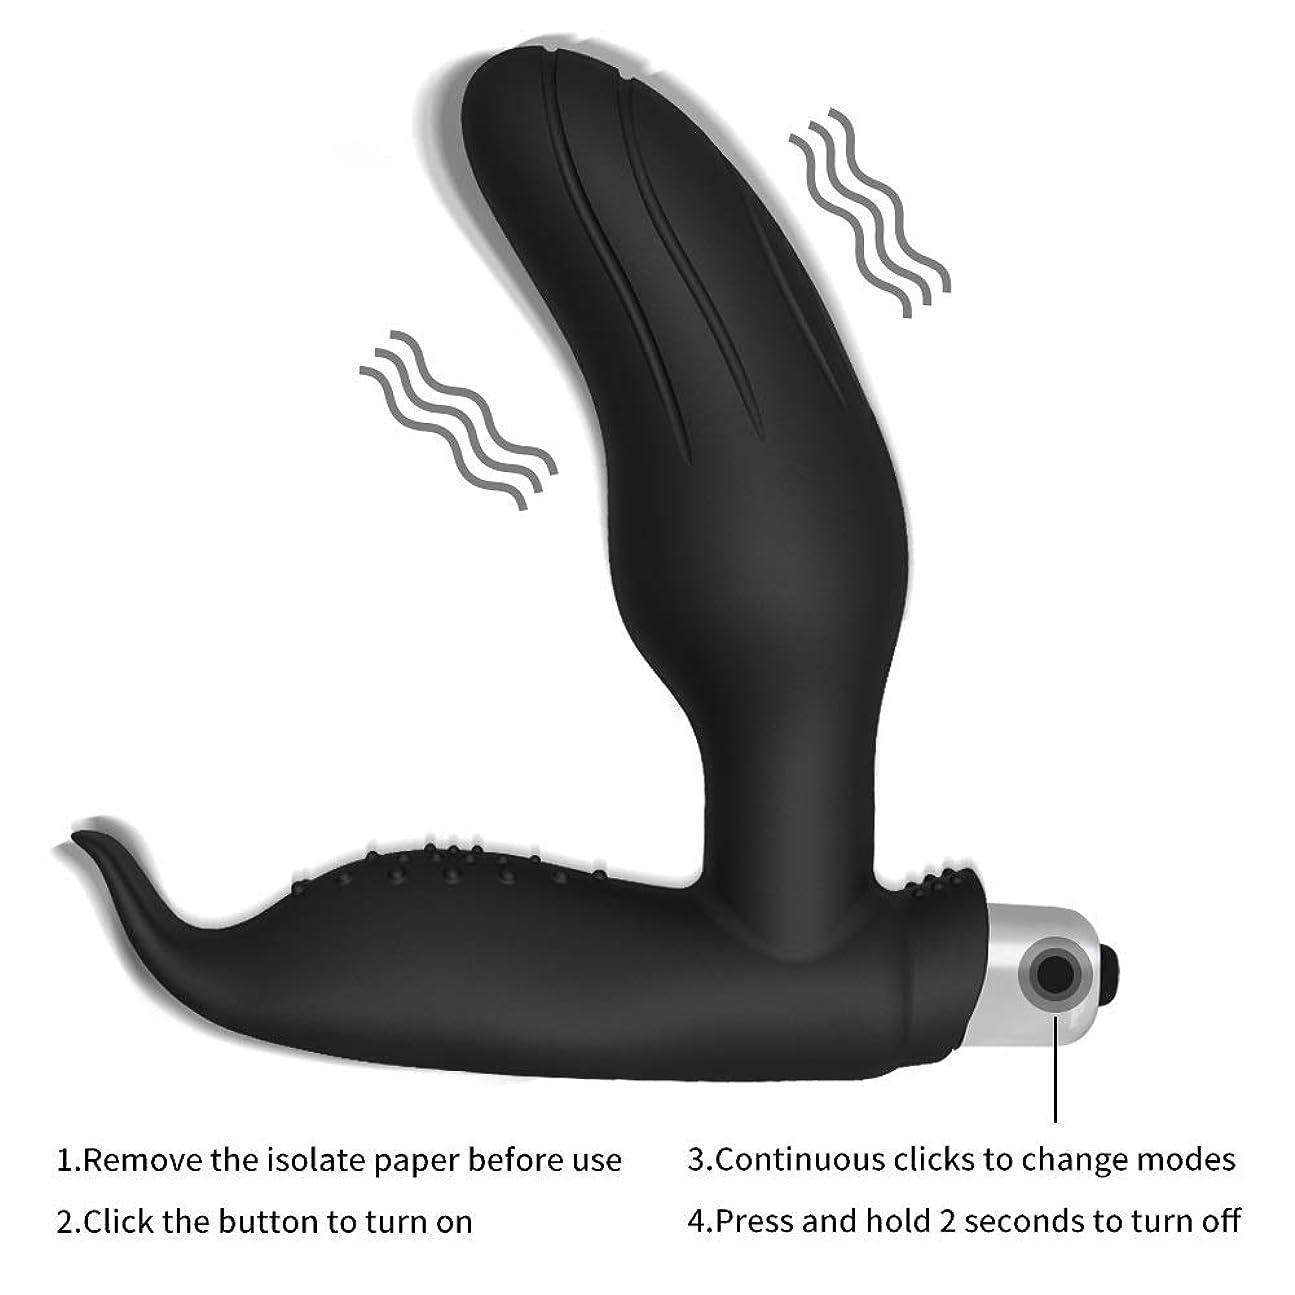 喉が渇いた経営者起点NZSZMHS Prostate Massager A-Man Plug用Man G Spot ButtplugVíbrators初心者